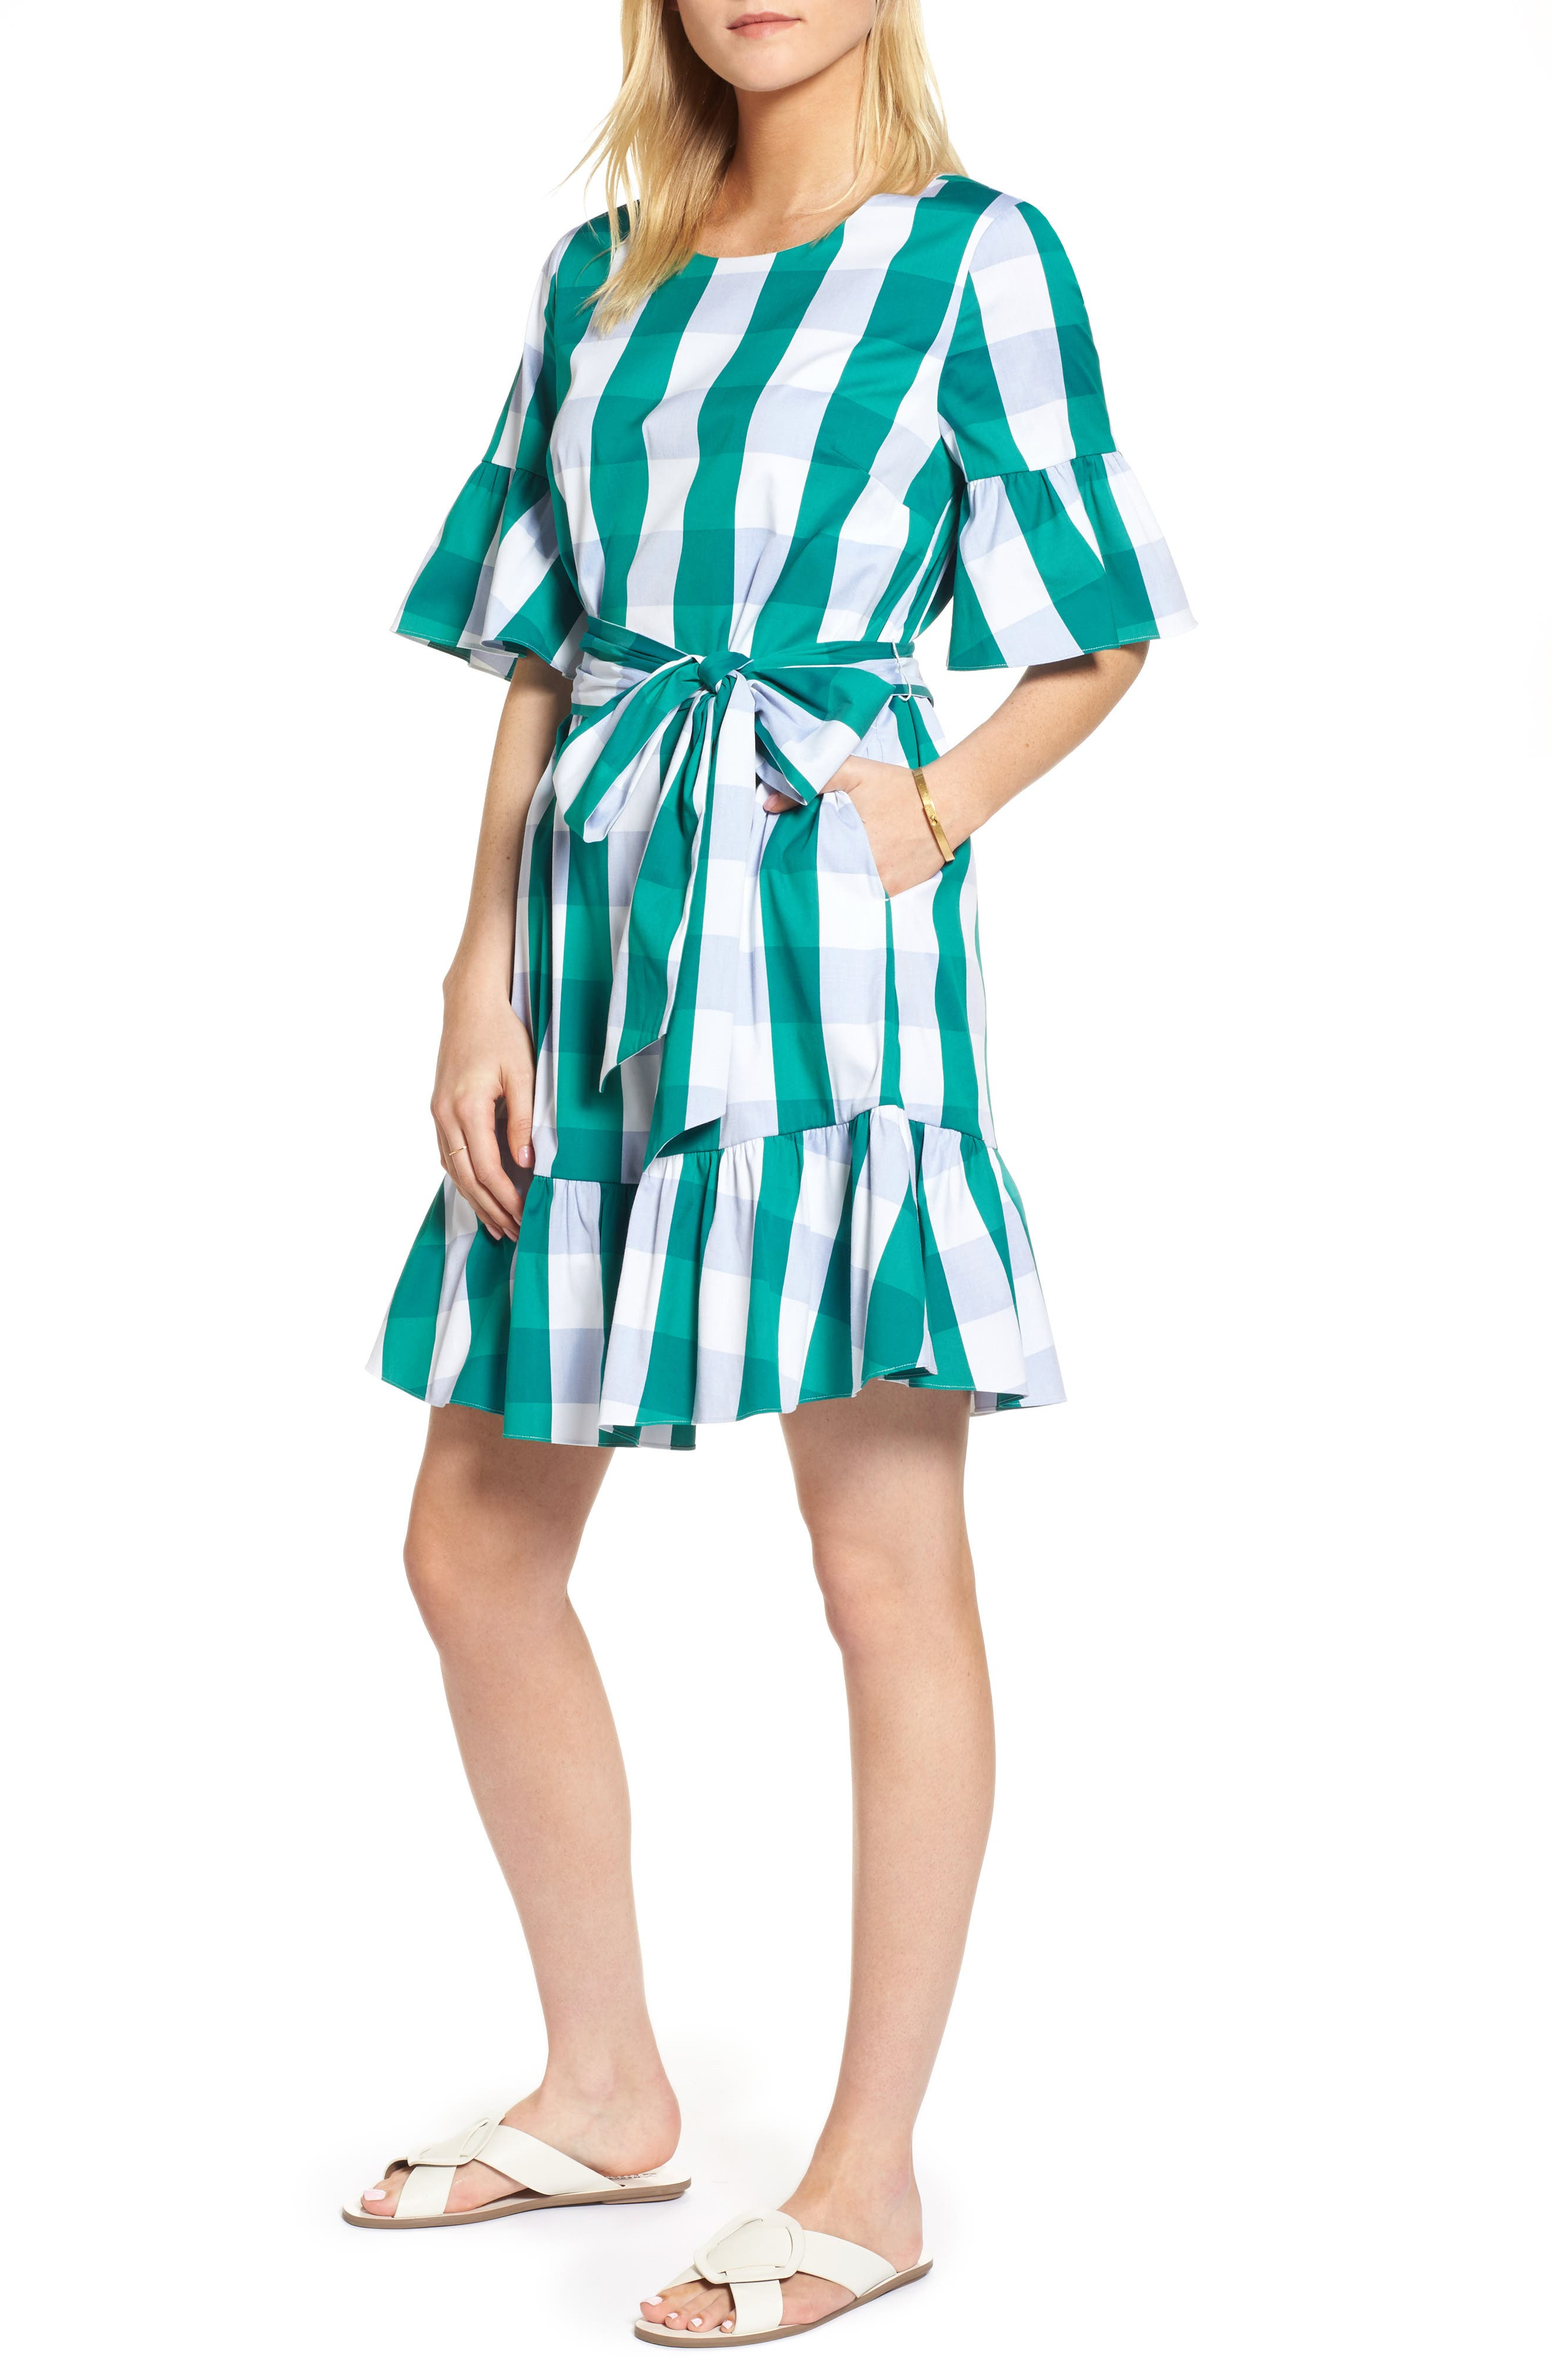 Ruffle & Bow Dress,                             Main thumbnail 1, color,                             Green- Blue Gingham